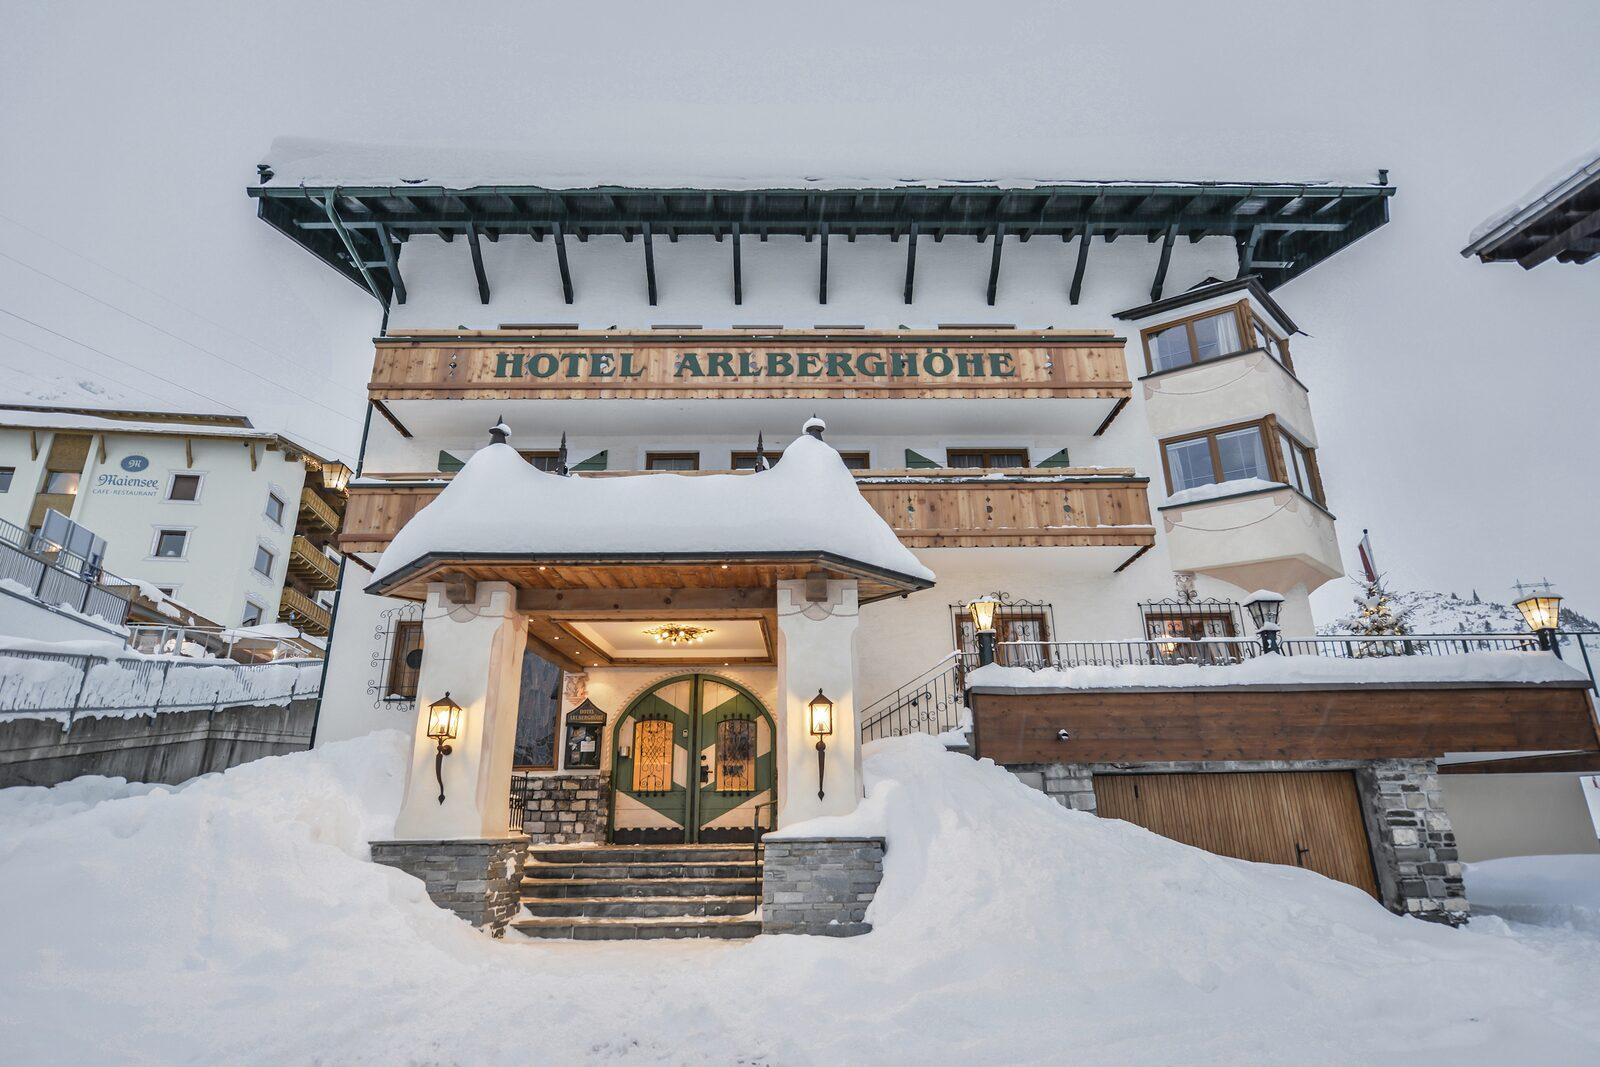 Hotel Arlberghöhe | Onbegrensd wintersportplezier in Tirol